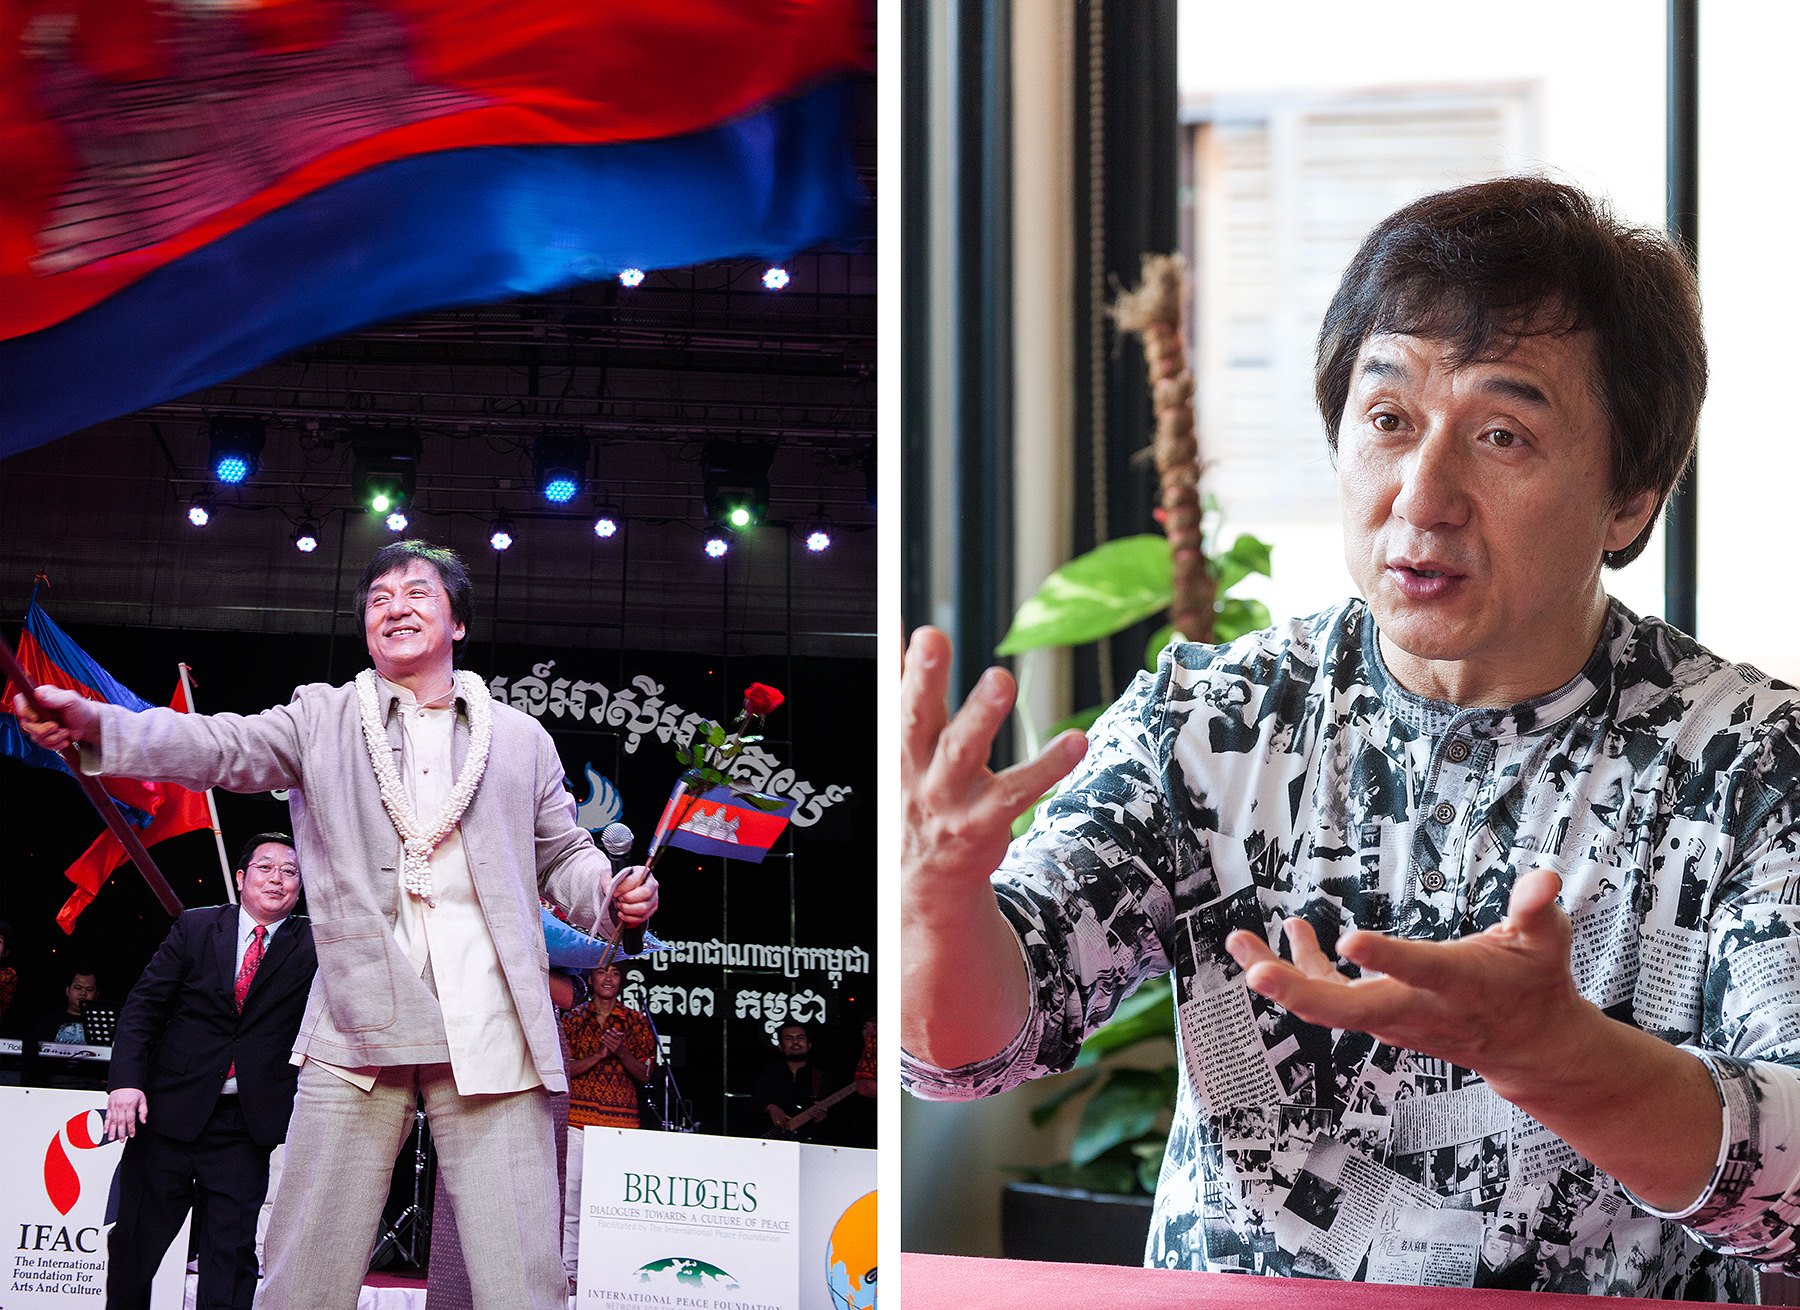 Jackie Chan, SEA TV and Malis Rstnt Phnom Penh, Bridges Int. Peace Foundation